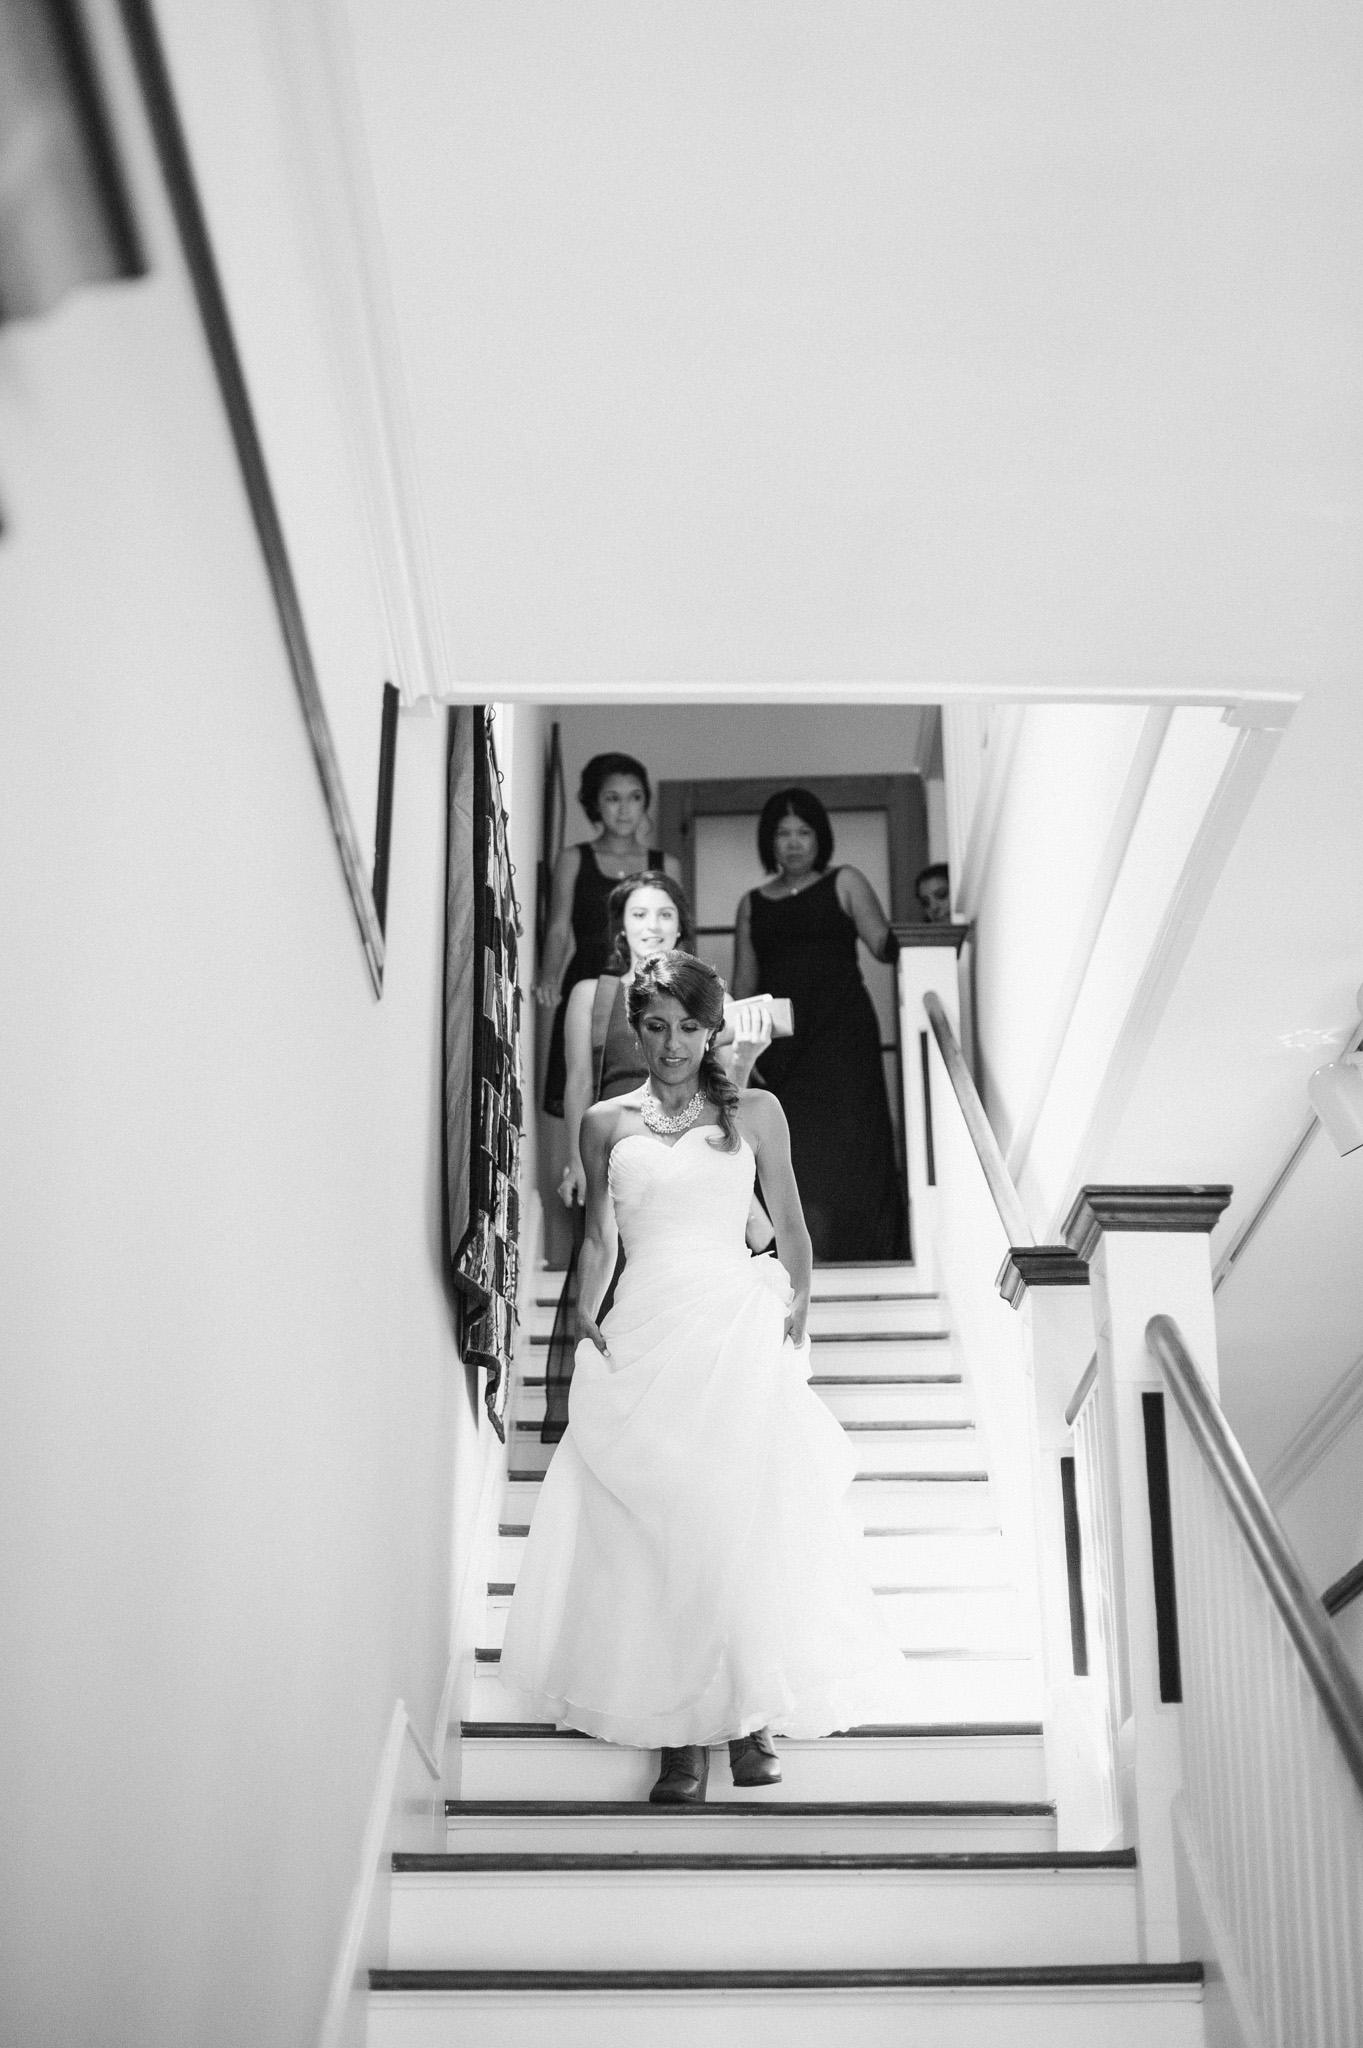 Cait and Javier Wedding-14.jpg